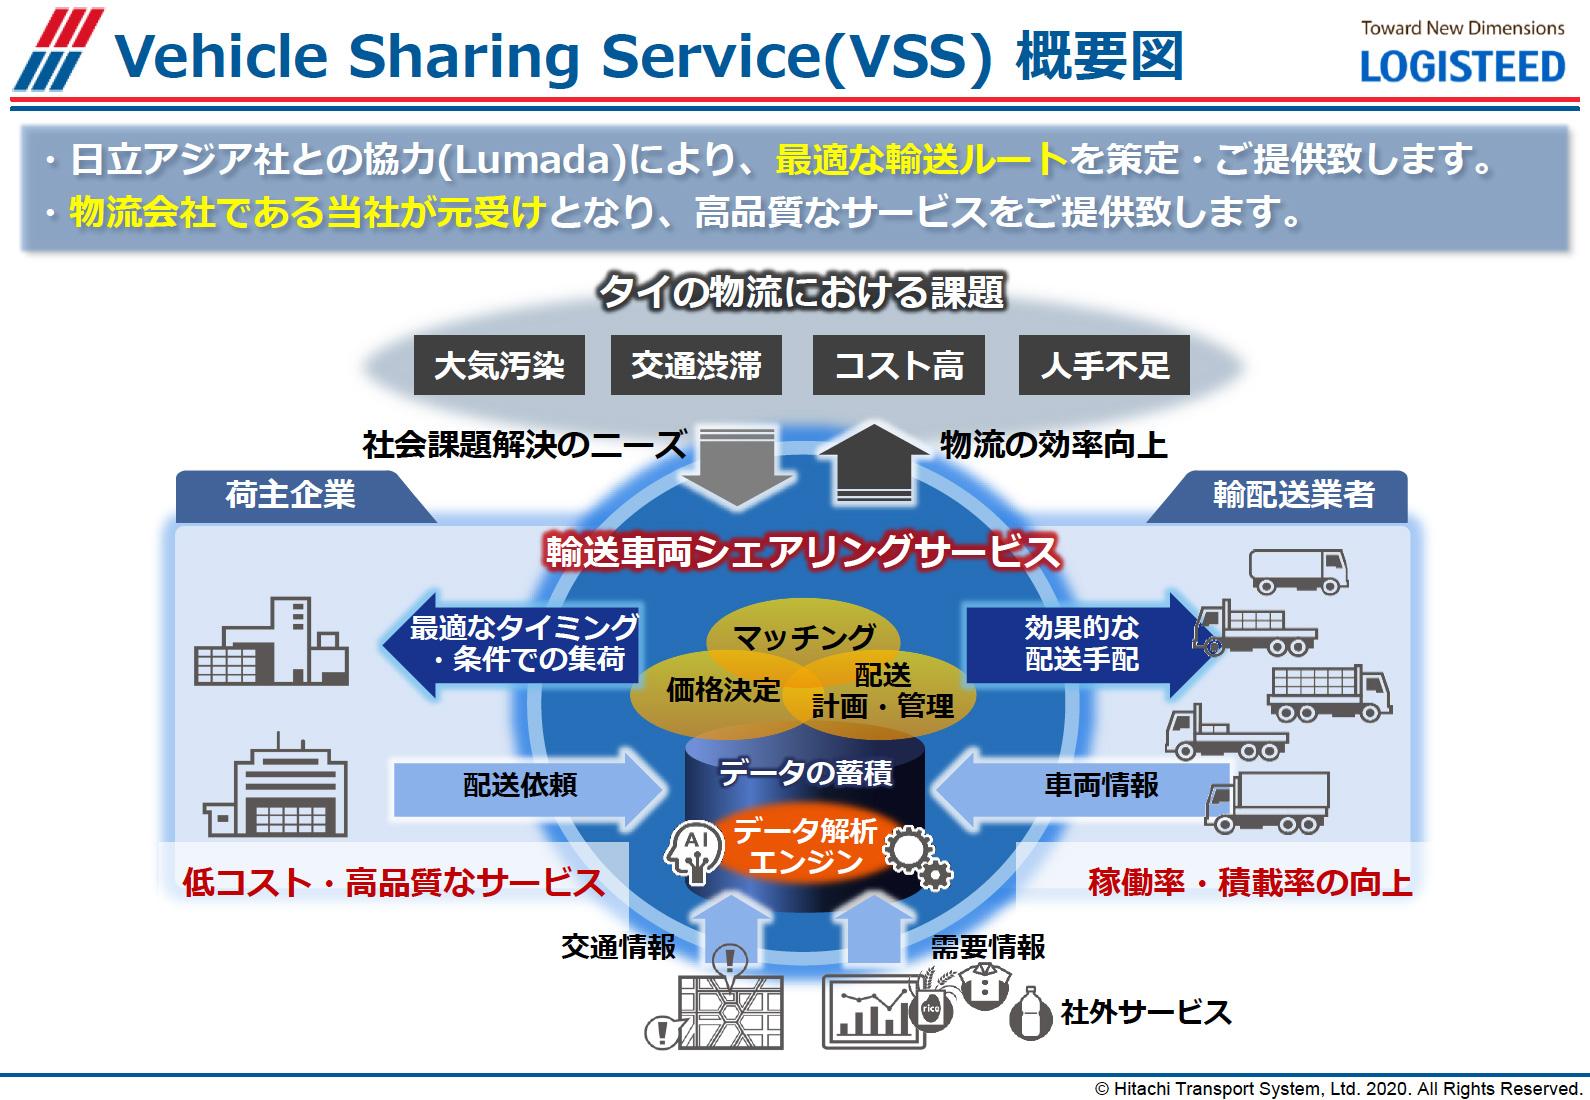 「Vehicle Sharing Service(VSS)概要図」